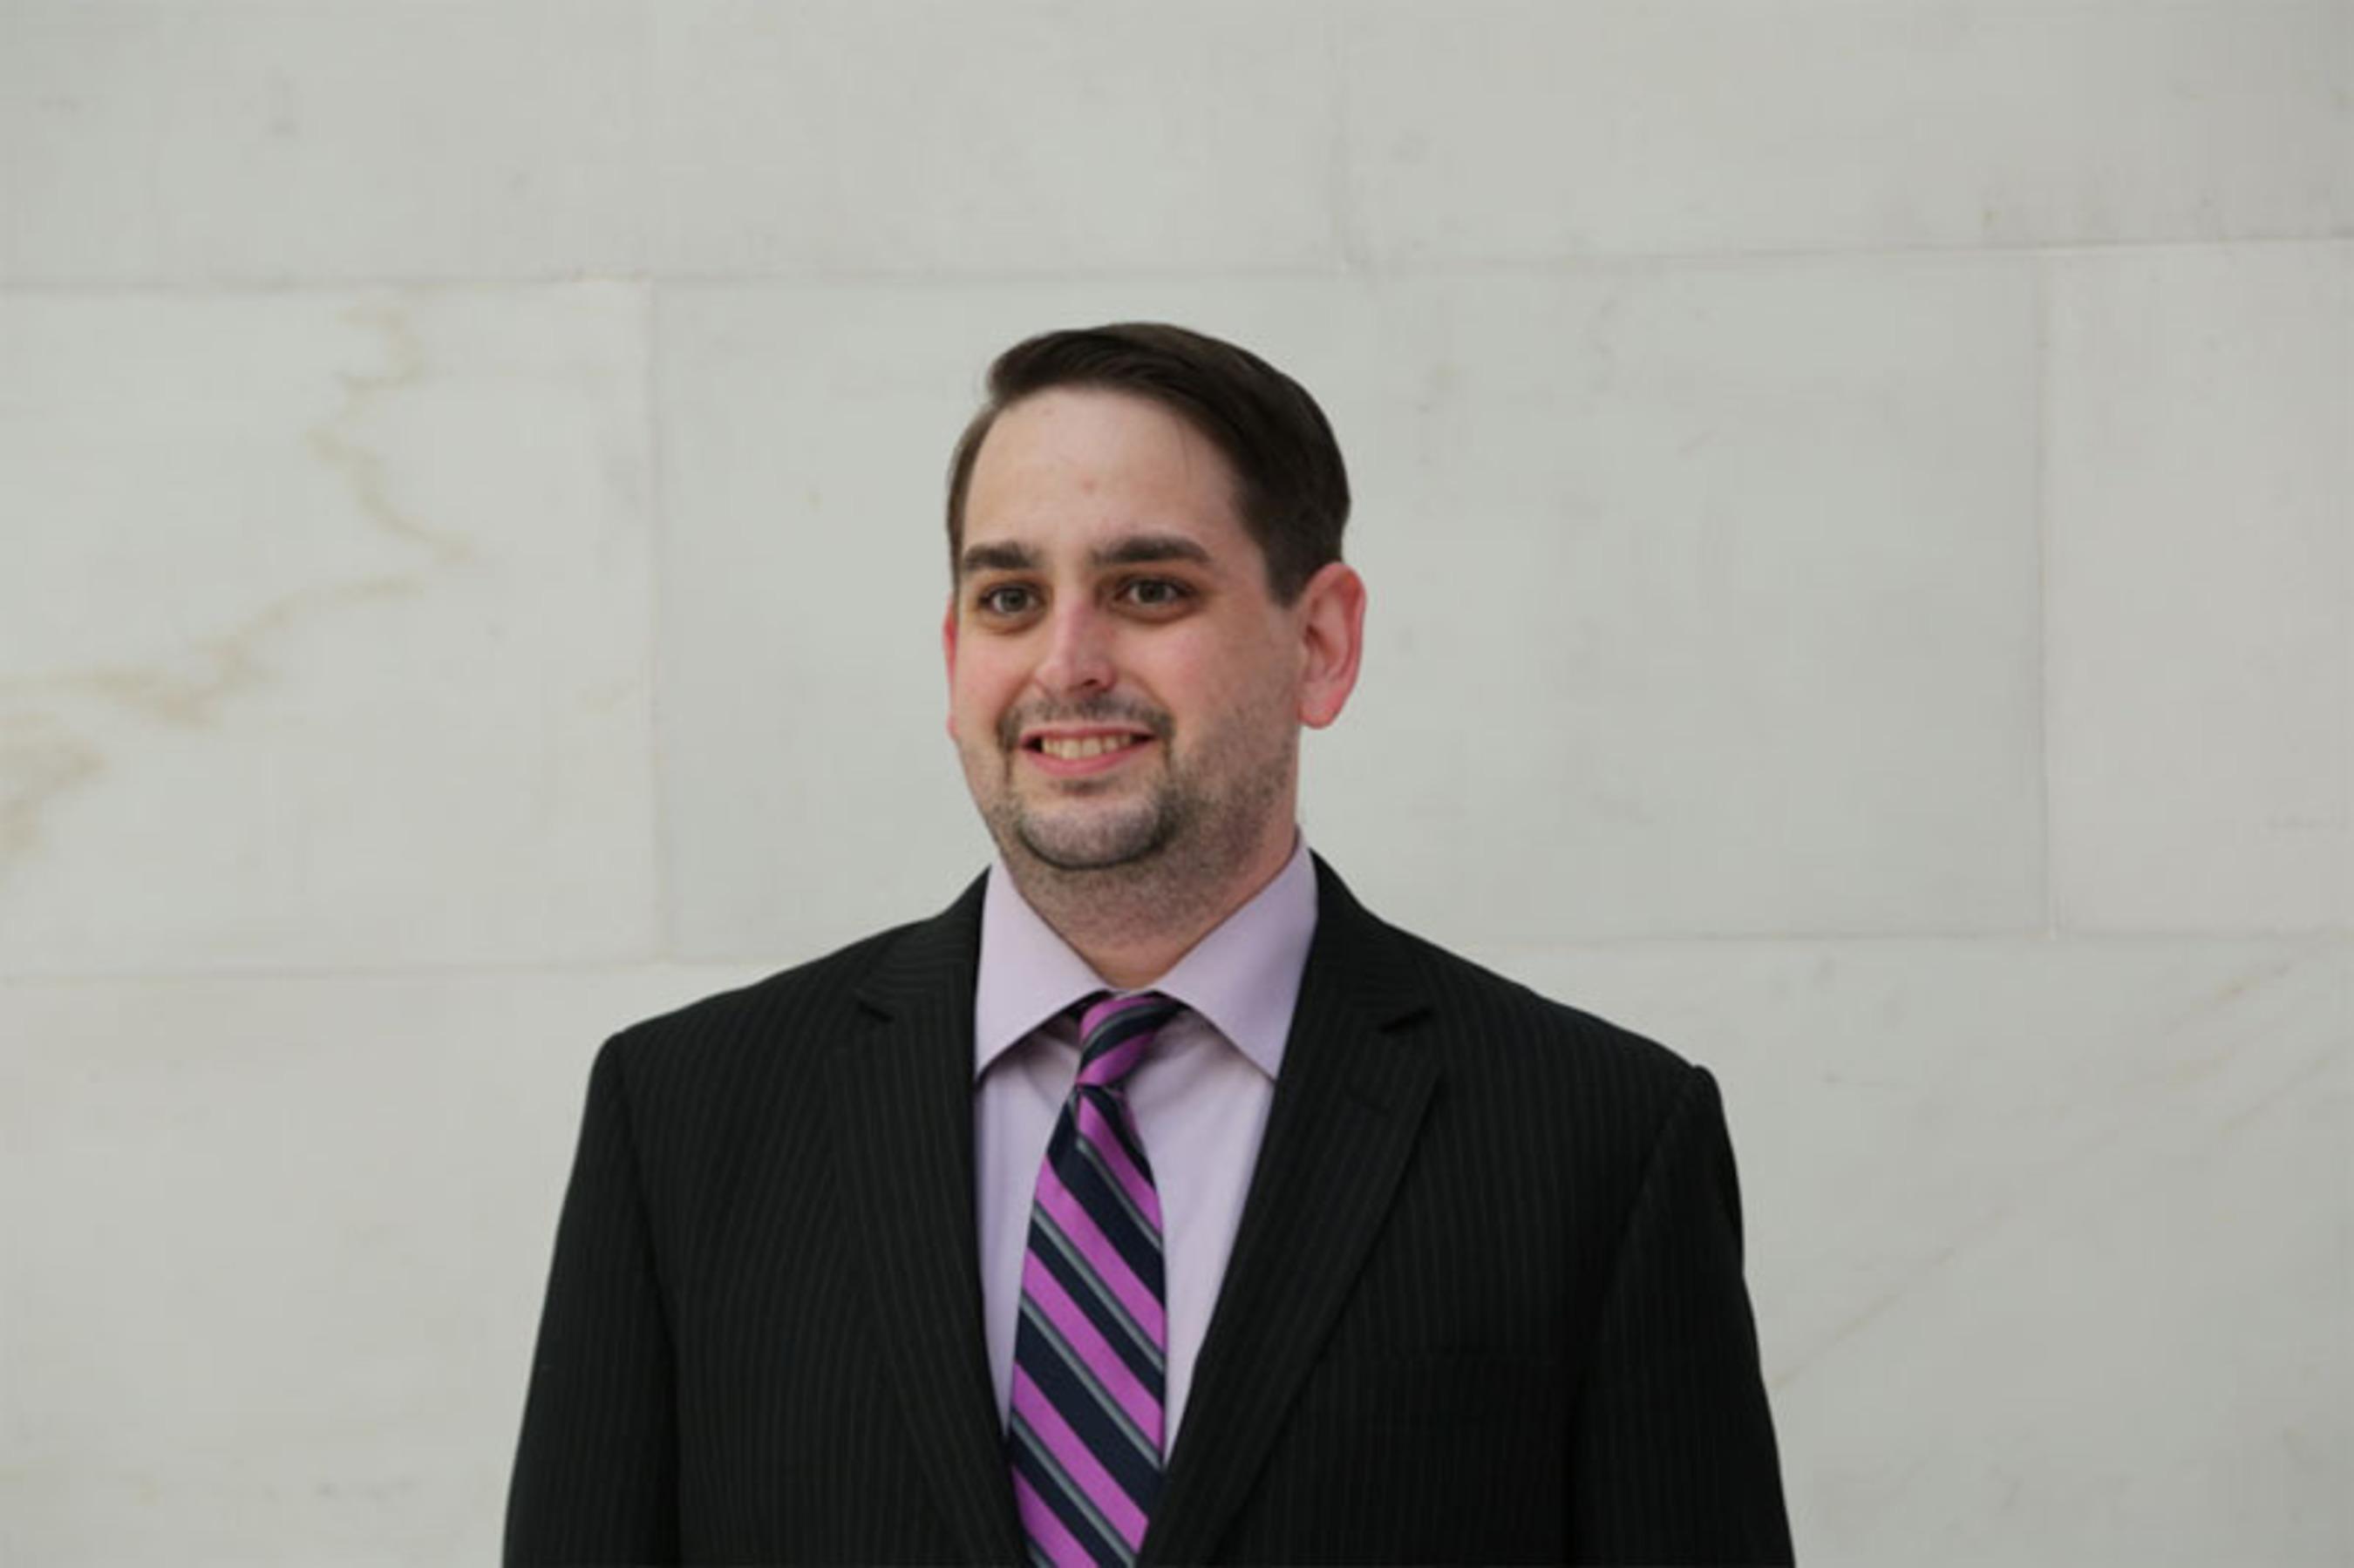 DUI Attorney Bob Mortland from Beahm Law. (PRNewsFoto/Beahm Law) (PRNewsFoto/BEAHM LAW)